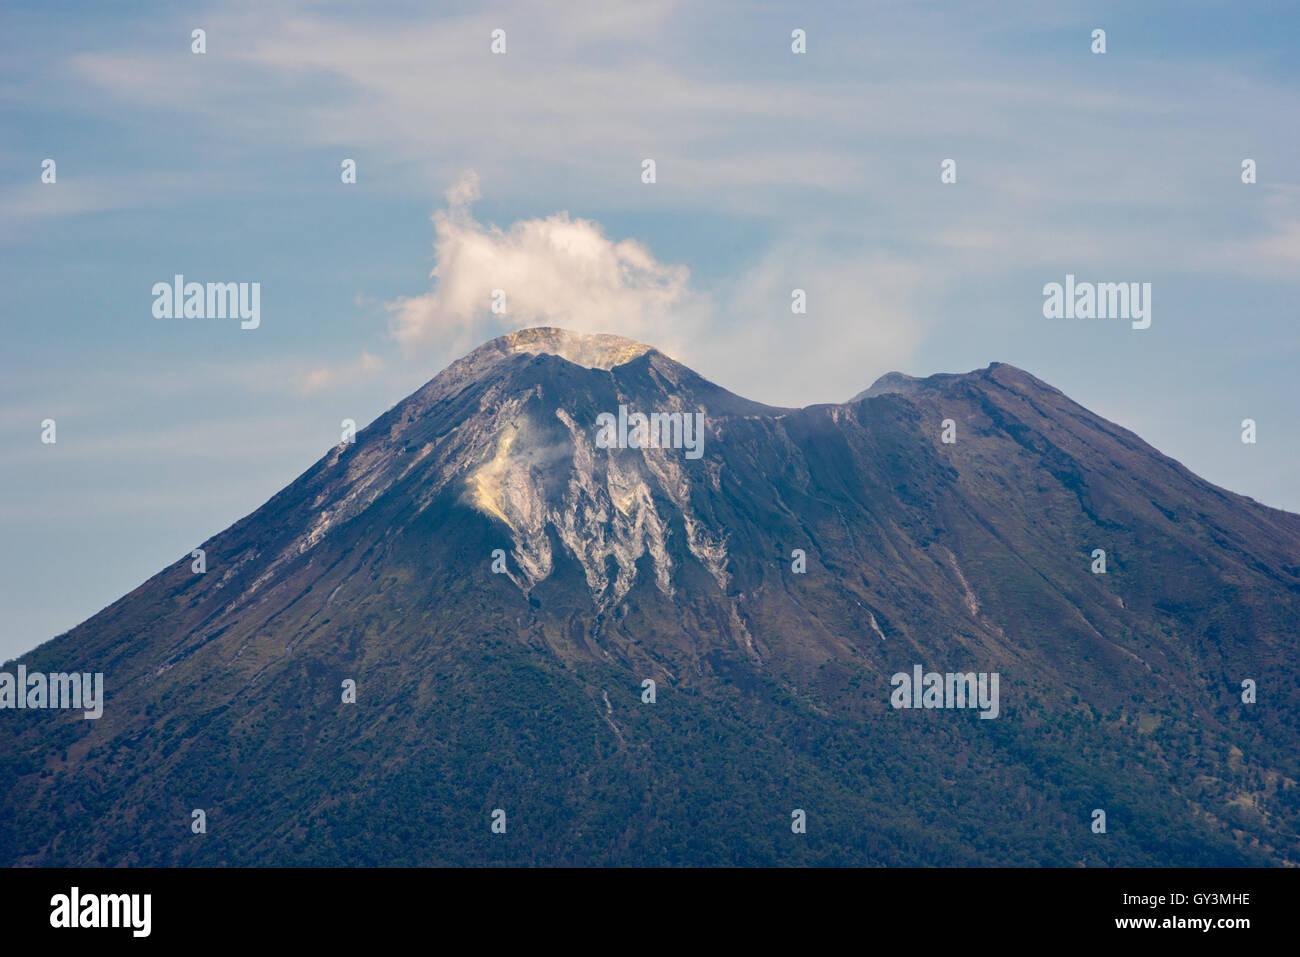 Mount Lewotolok volcano in Lembata Island, East Nusa Tenggara, Indonesia. - Stock Image